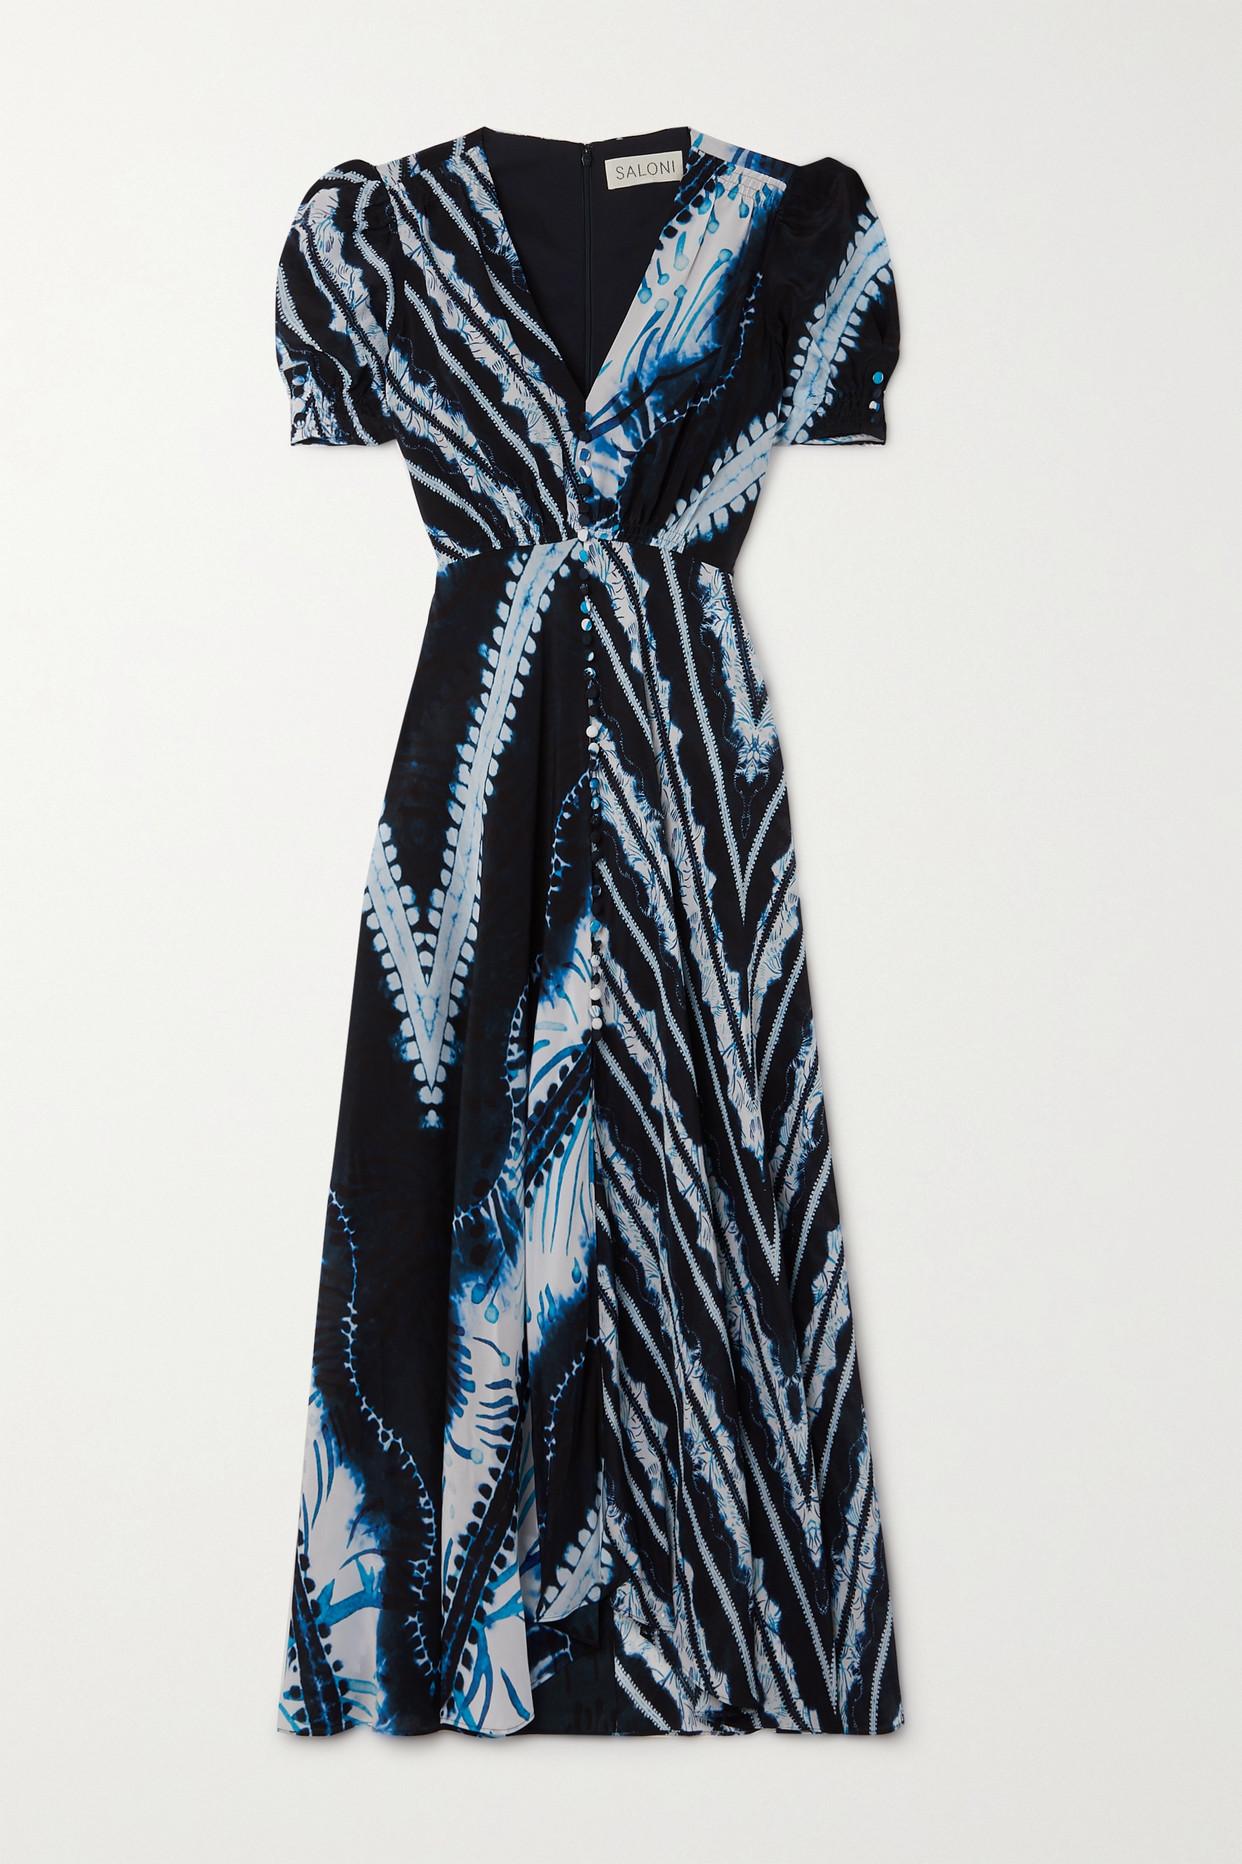 SALONI - Lea Printed Silk Crepe De Chine Midi Dress - Blue - UK6